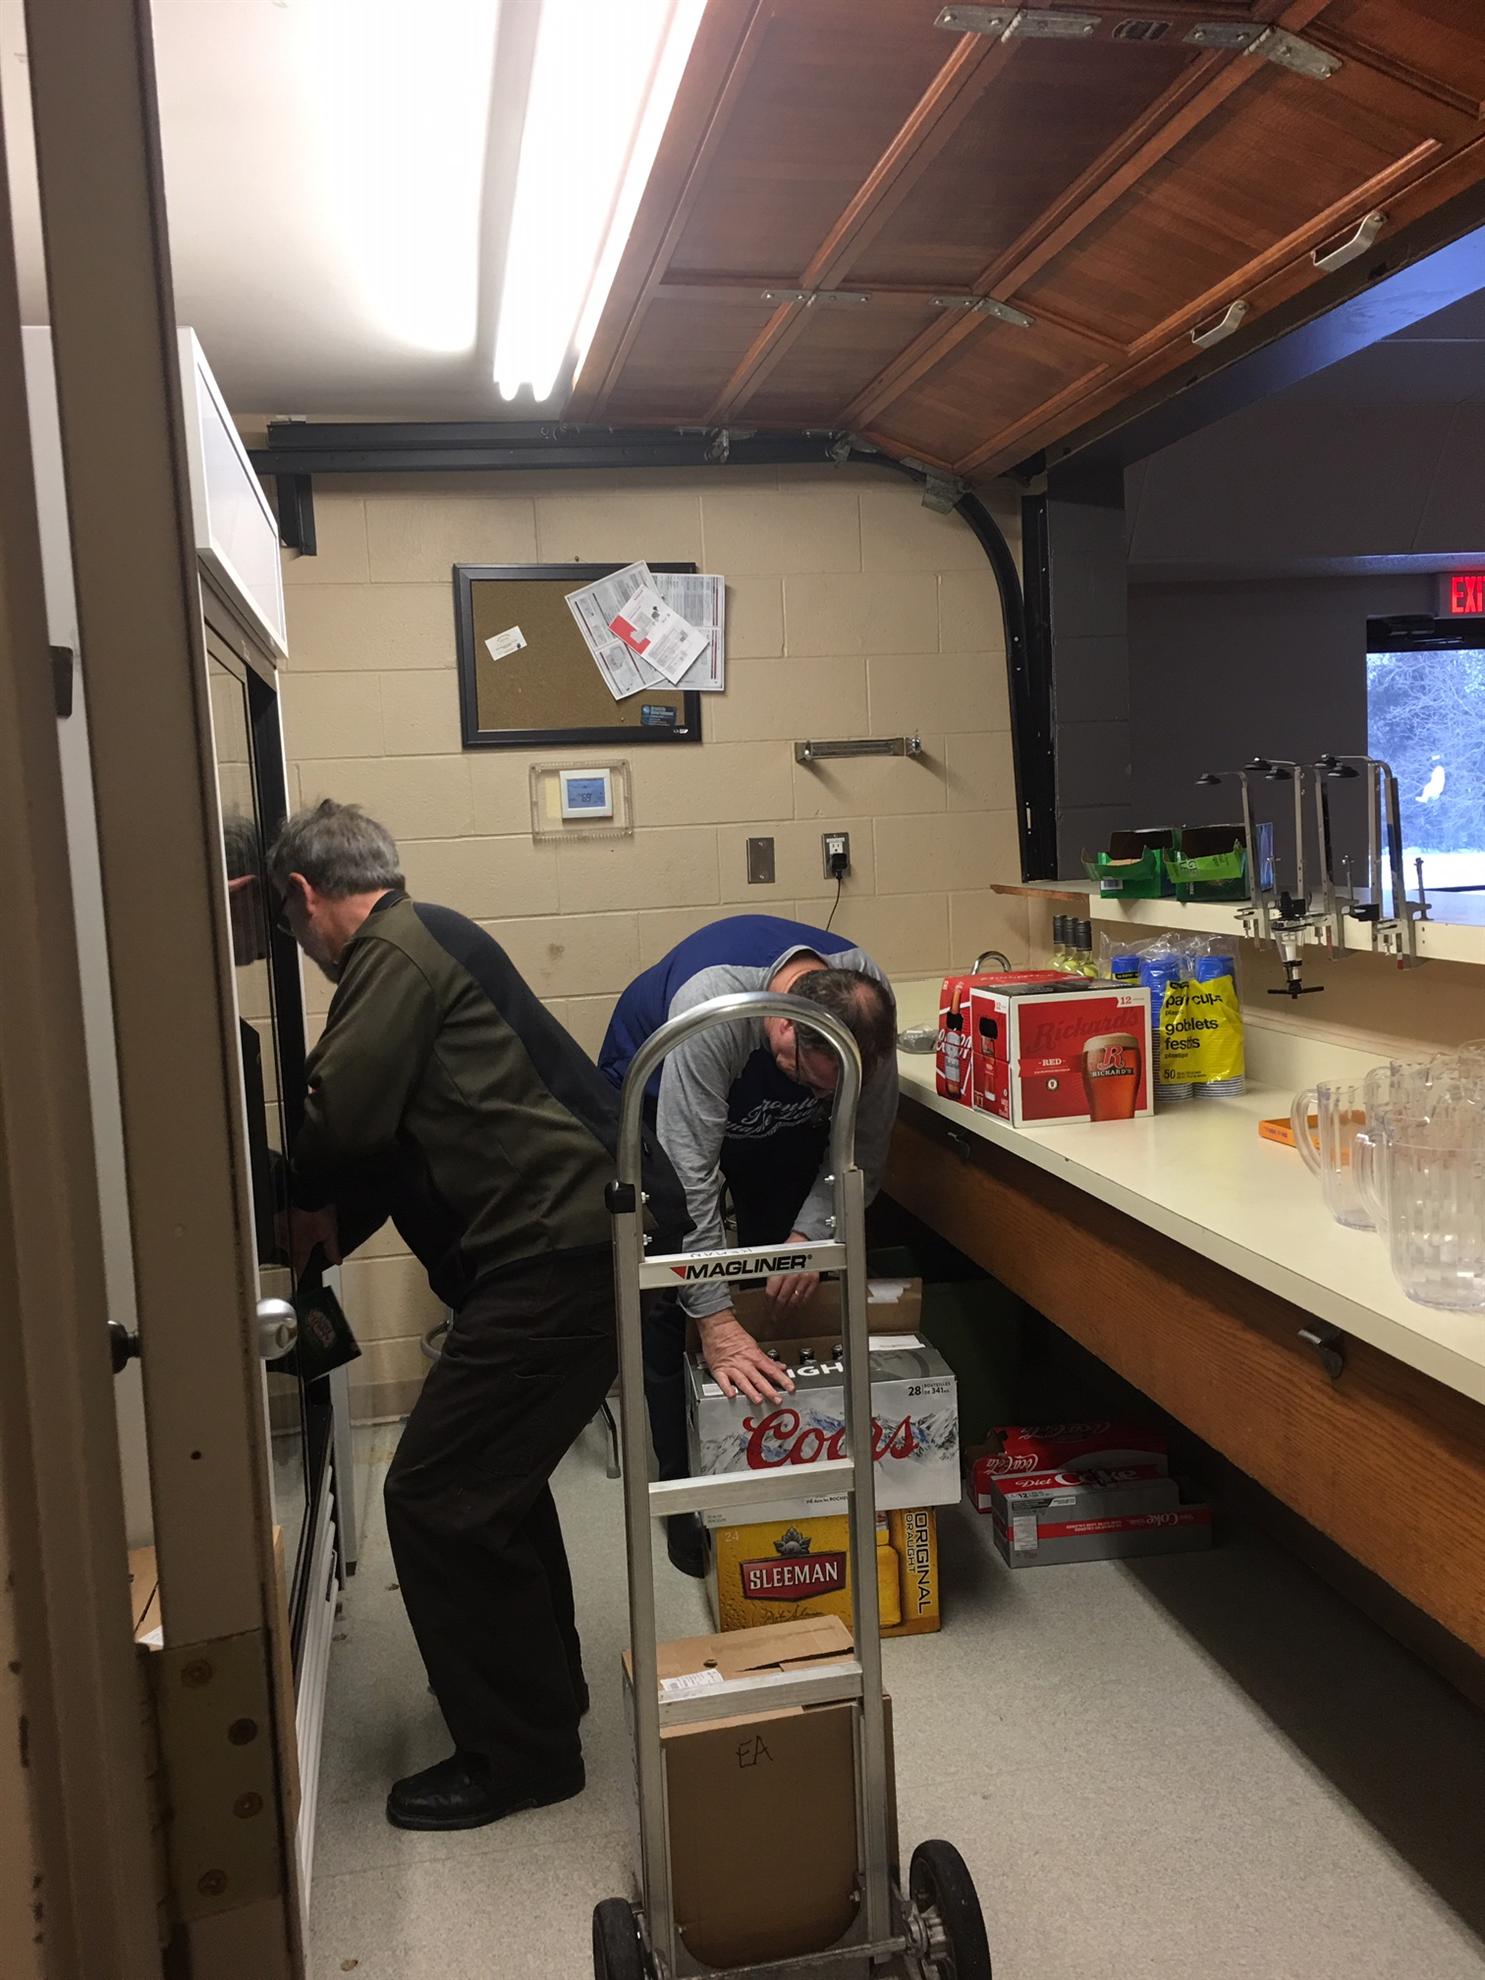 Loading up the bar fridge